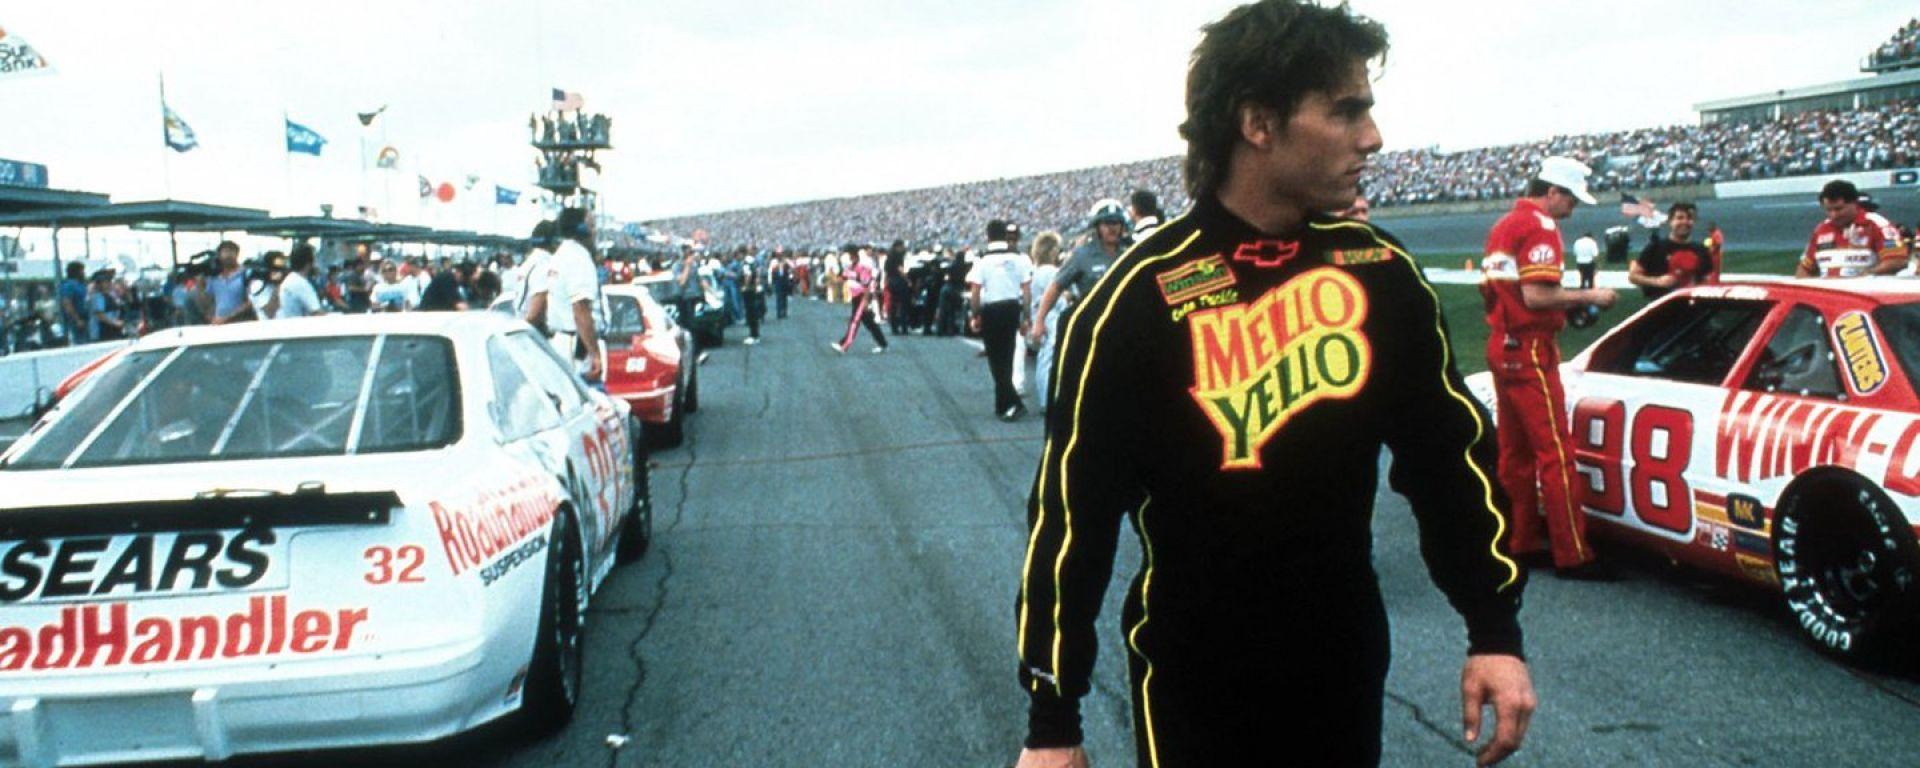 Tom Cruise in Days of Thunder (1990, Tony Scott) - Giorni di tuono